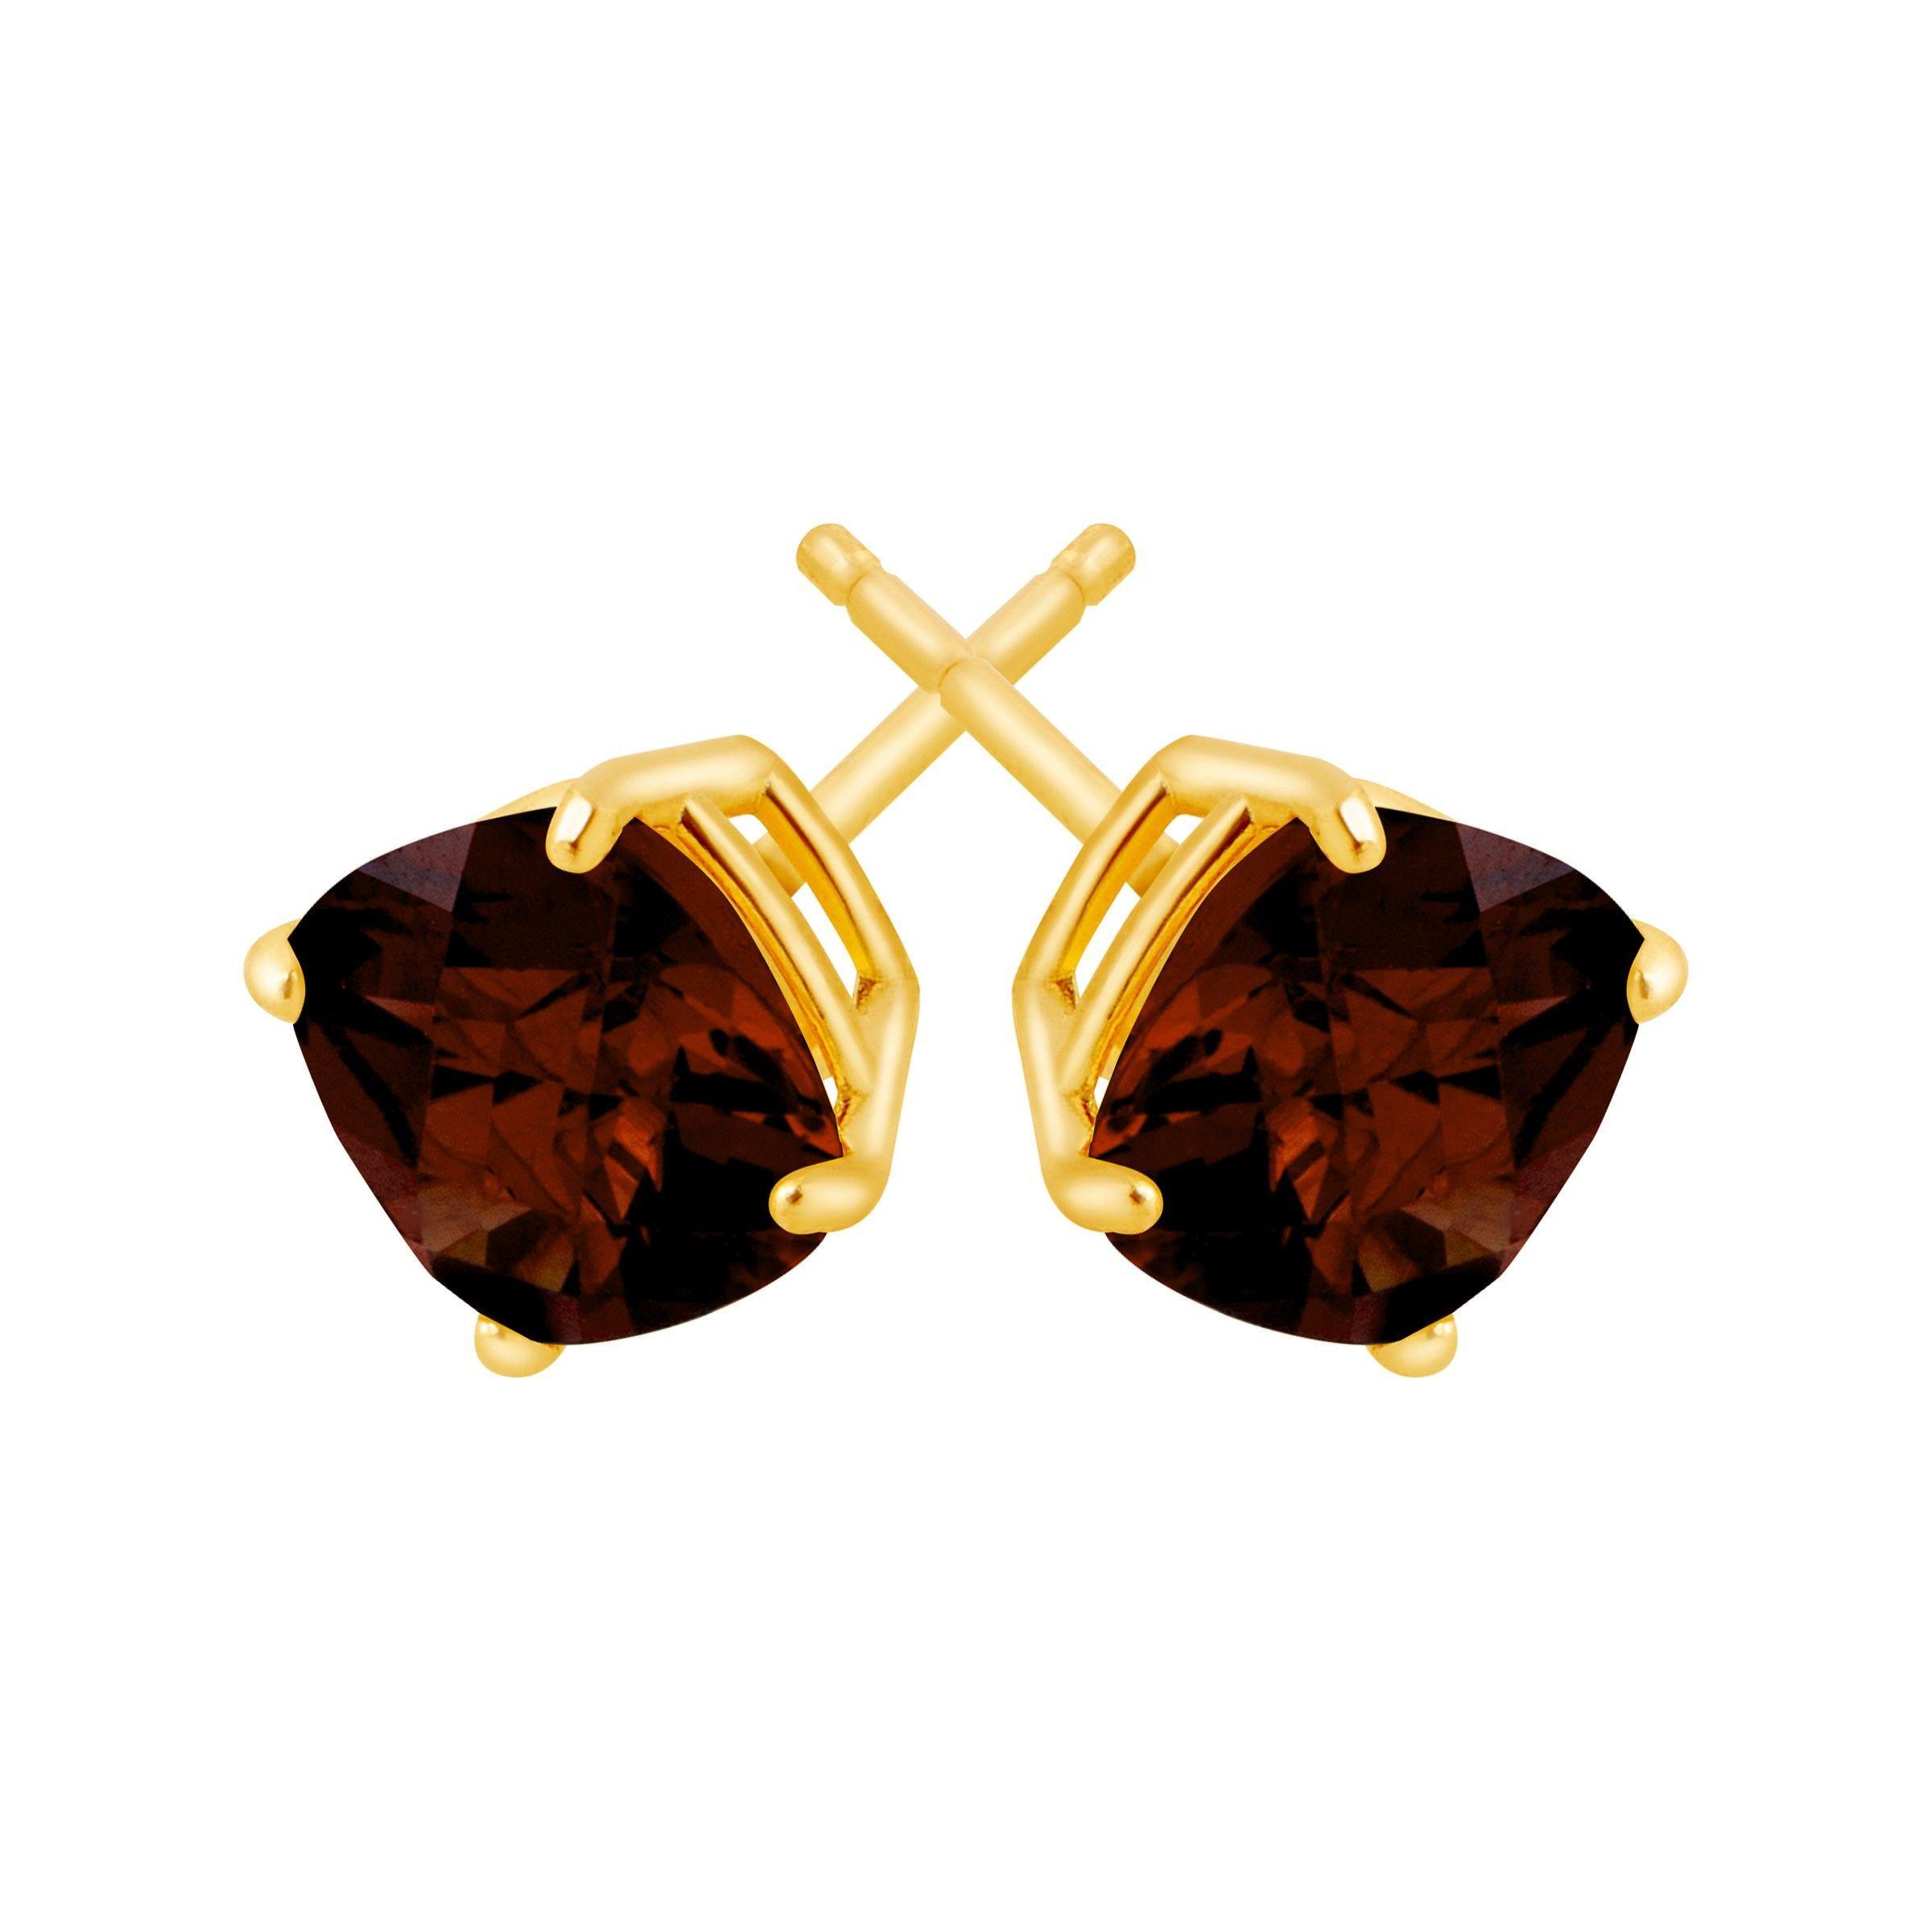 Cushion-Cut-Color-Stone-Stud-Earrings-in-14K-Gold thumbnail 22